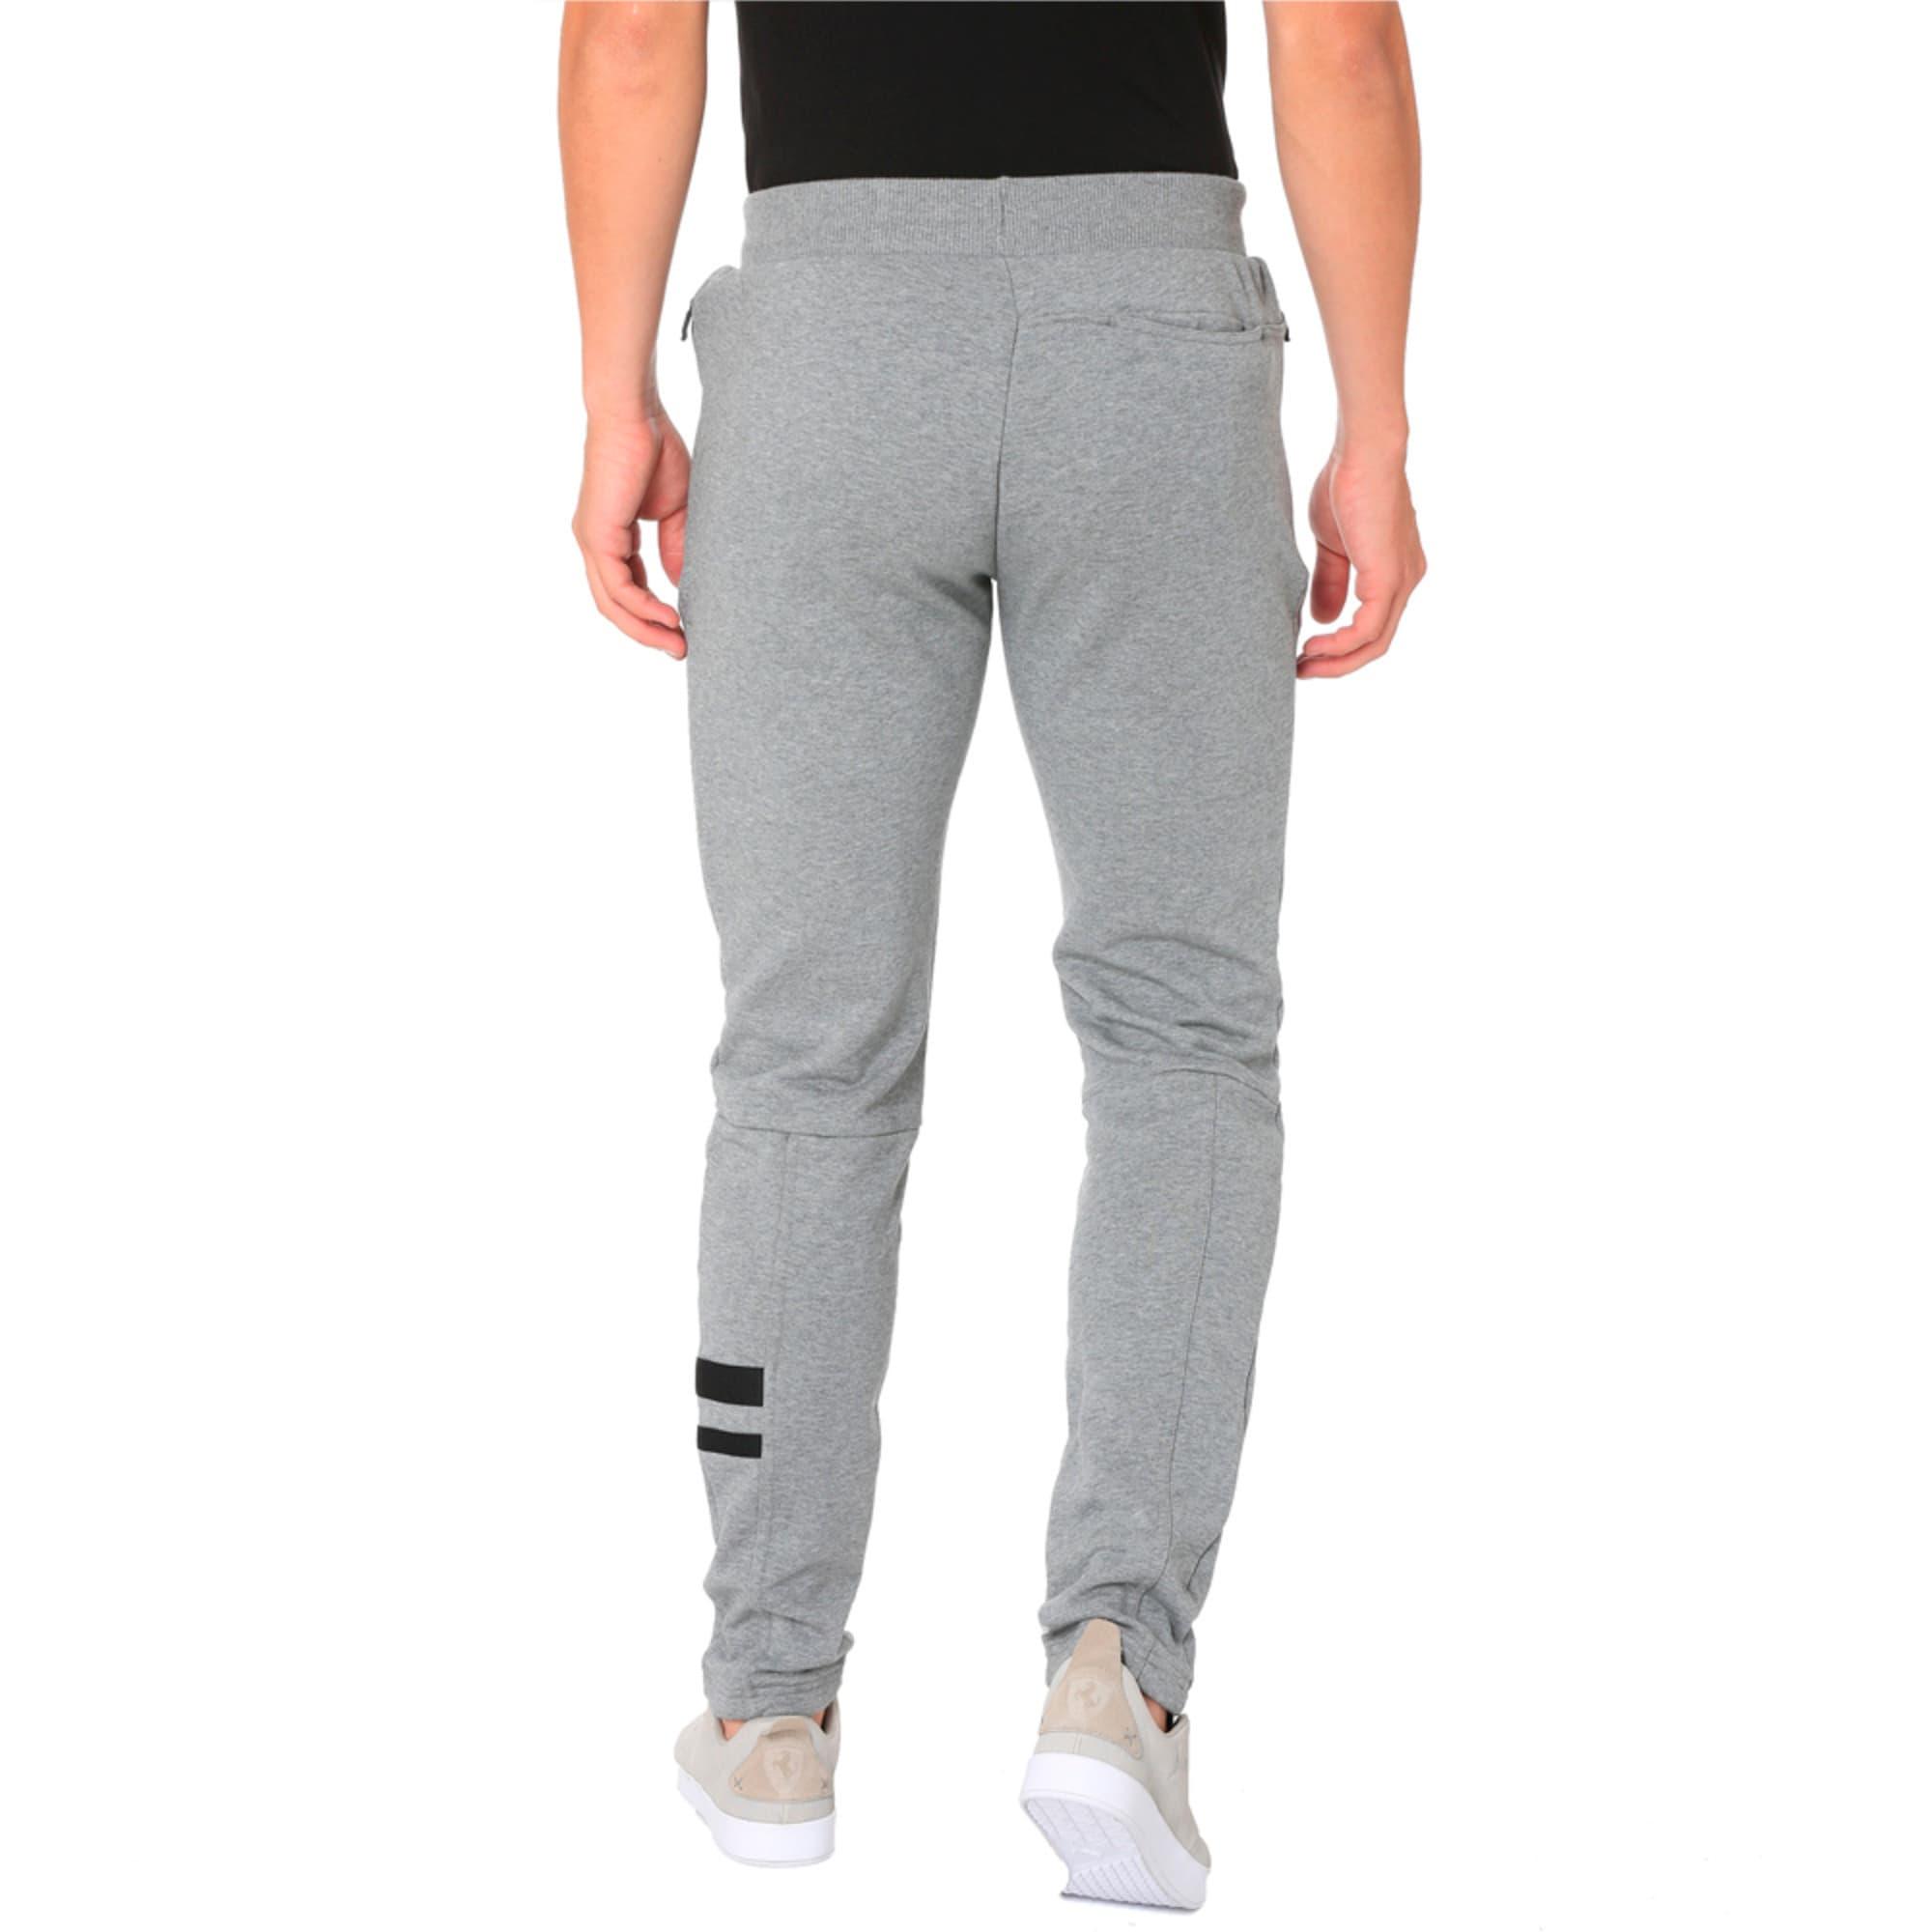 Thumbnail 2 of Ferrari Lifestyle Men's Sweatpants, Medium Gray Heather, medium-IND